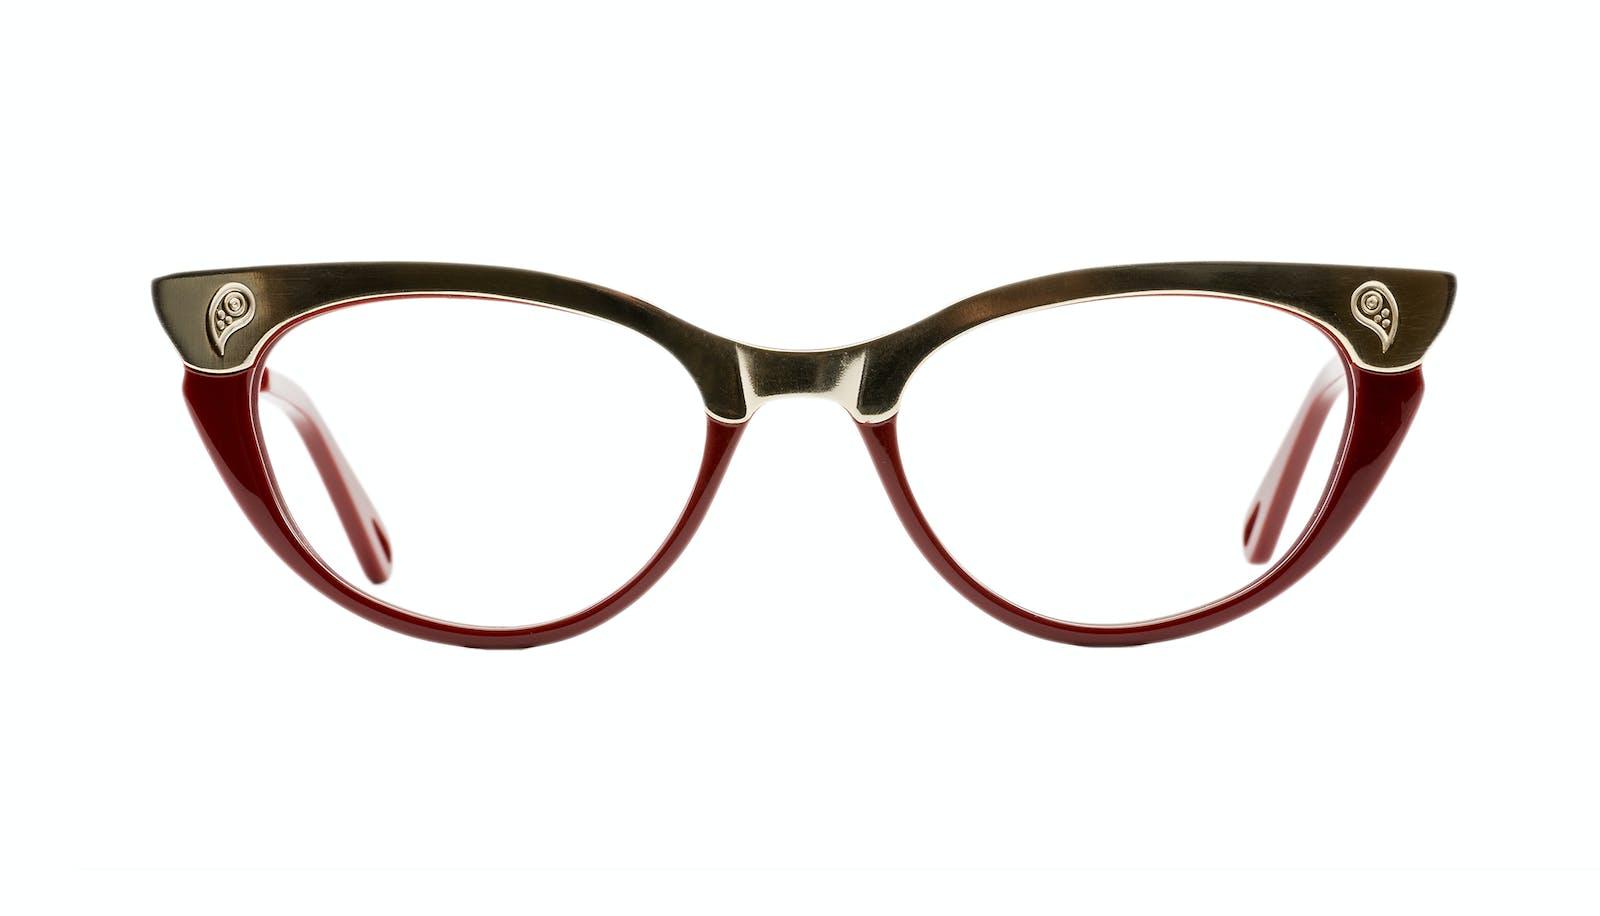 4650a175189c Affordable Fashion Glasses Cat Eye Daring Cateye Eyeglasses Women Bad Beti  Paro